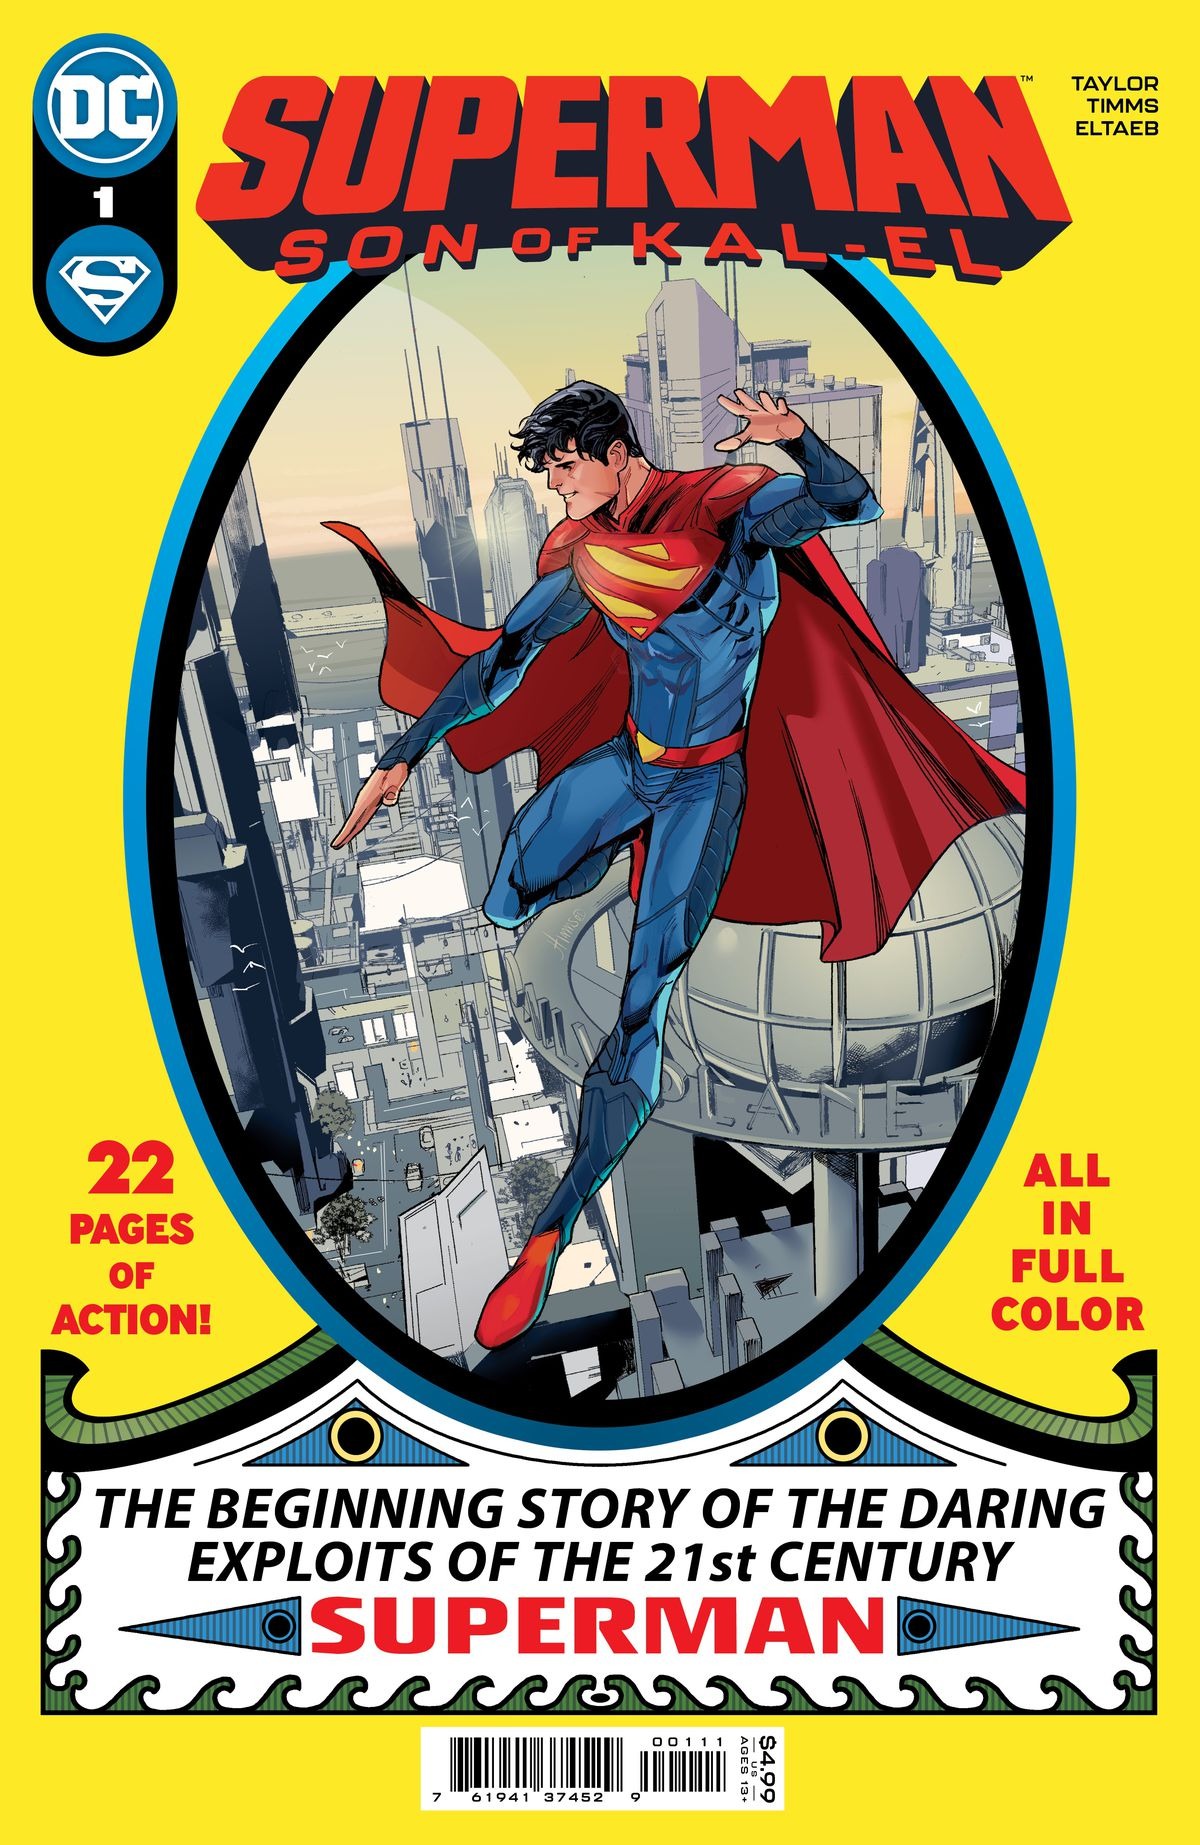 Jon Kent hovers above Metropolis in an homage to the cover of Superman #1, in the cover of Superman: Son of Kal-El #1, DC Comics (2021).